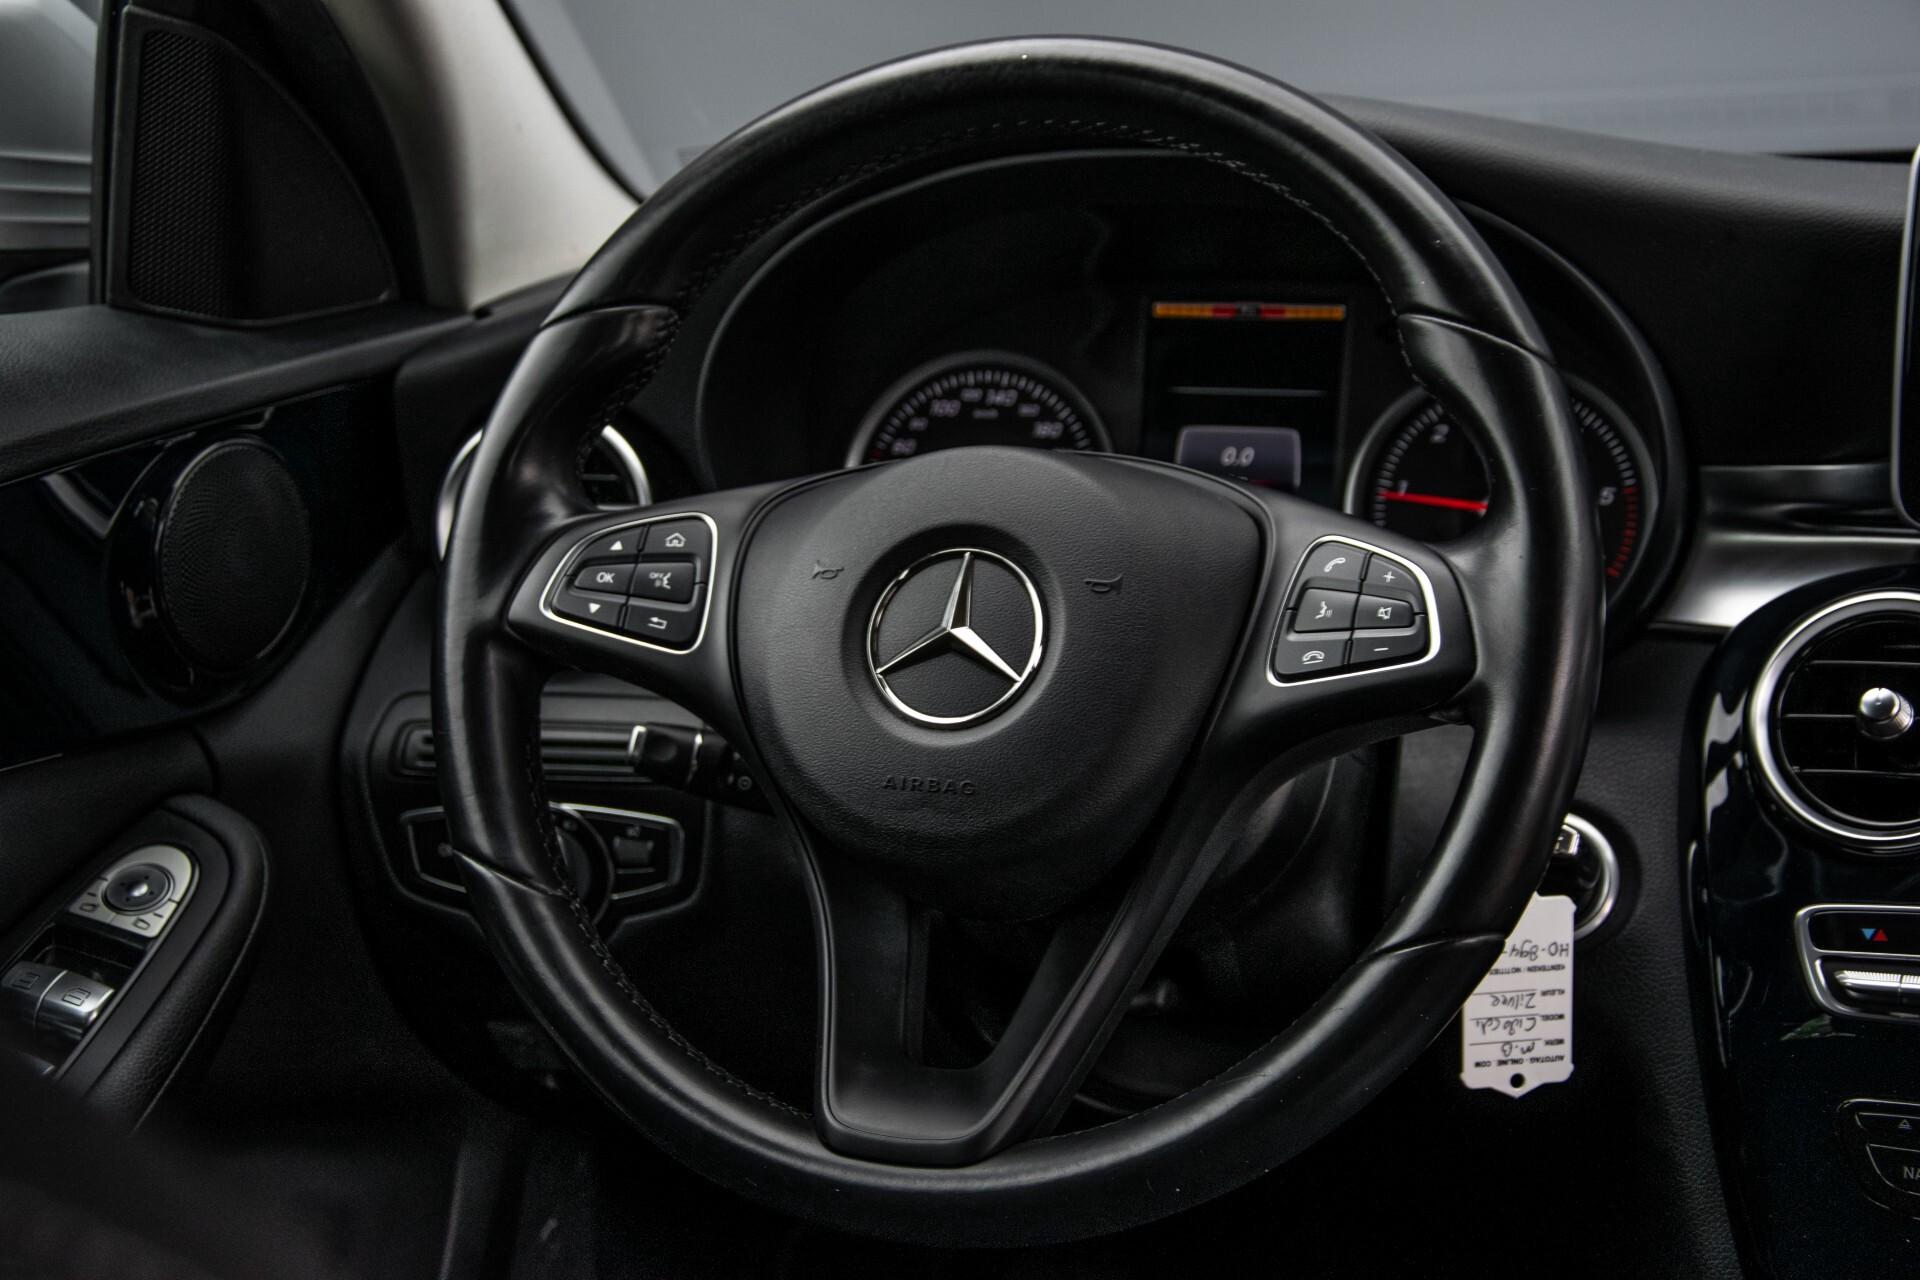 Mercedes-Benz C-Klasse 180 Bluetec Lease Edition Intelligent Light System/Cruise Control/Navi Foto 8